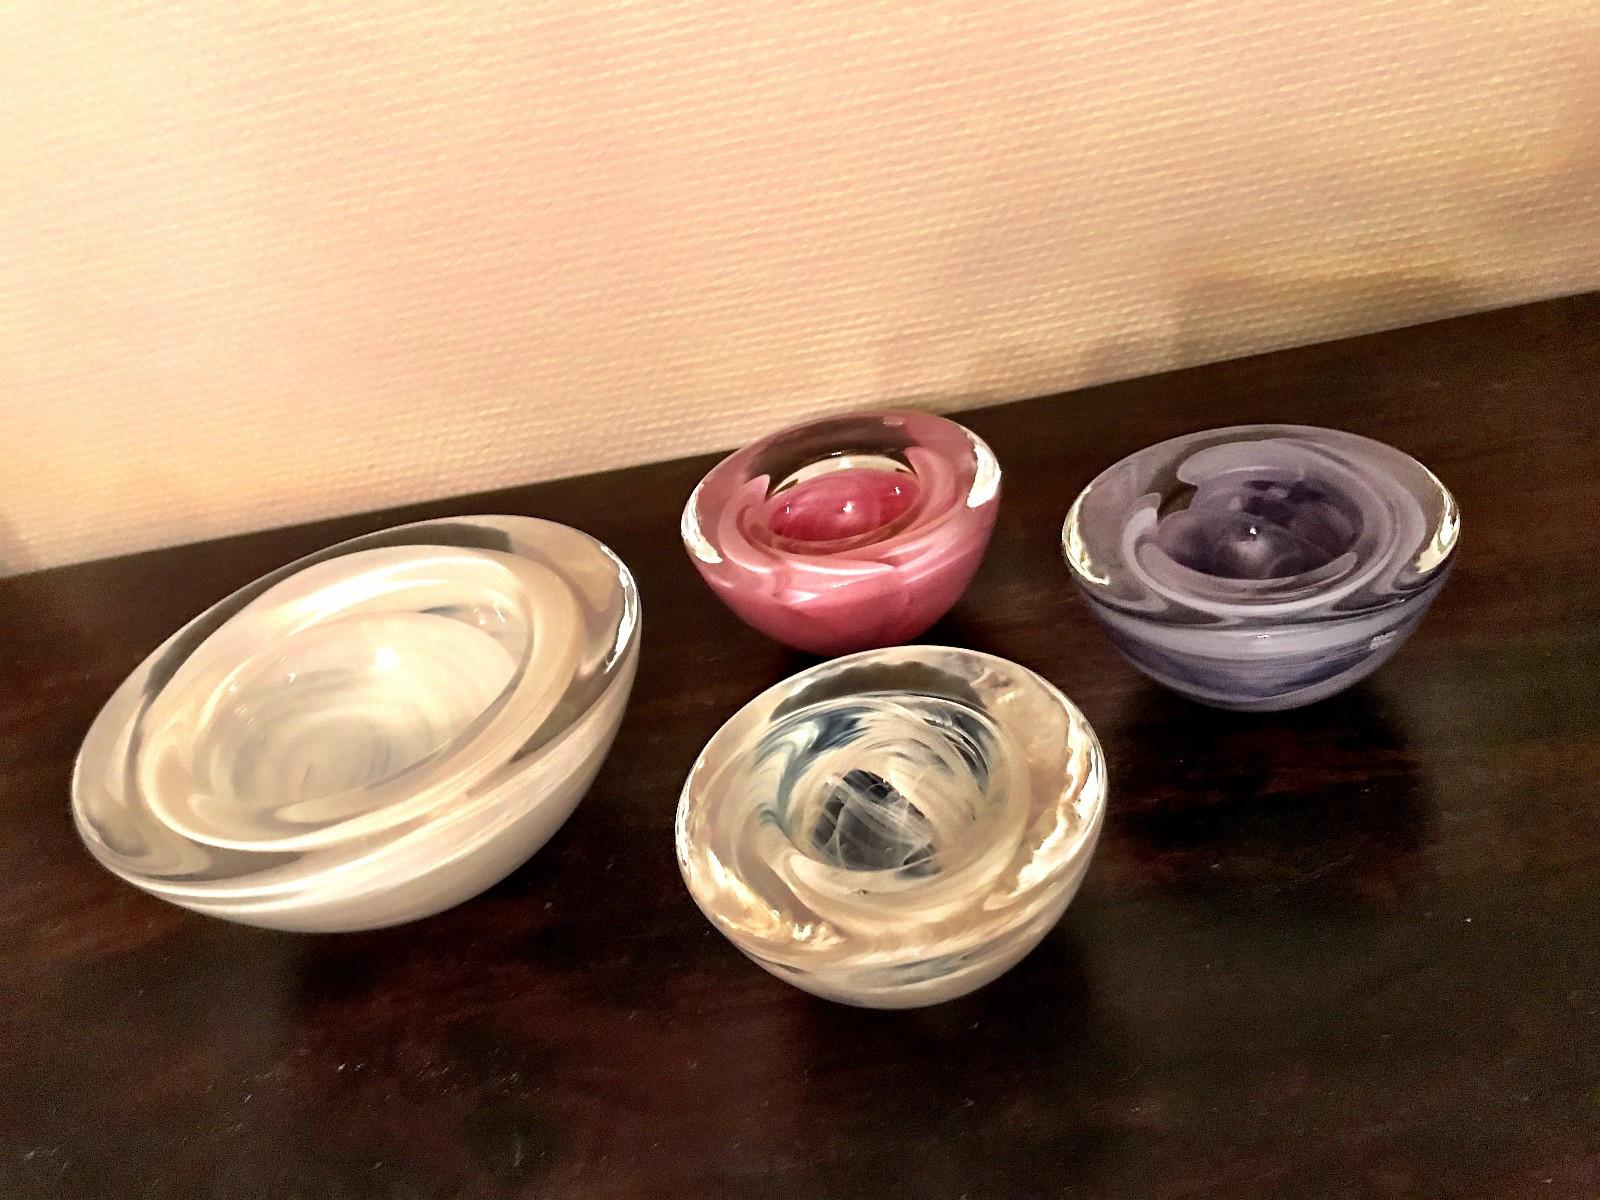 Kosta Boda skål og telysholdere - Oslo  - Kosta Boda skål i hvitt (16 cm) + 3 telysholdere (hvit, rosa, lilla) selges samlet. - Oslo